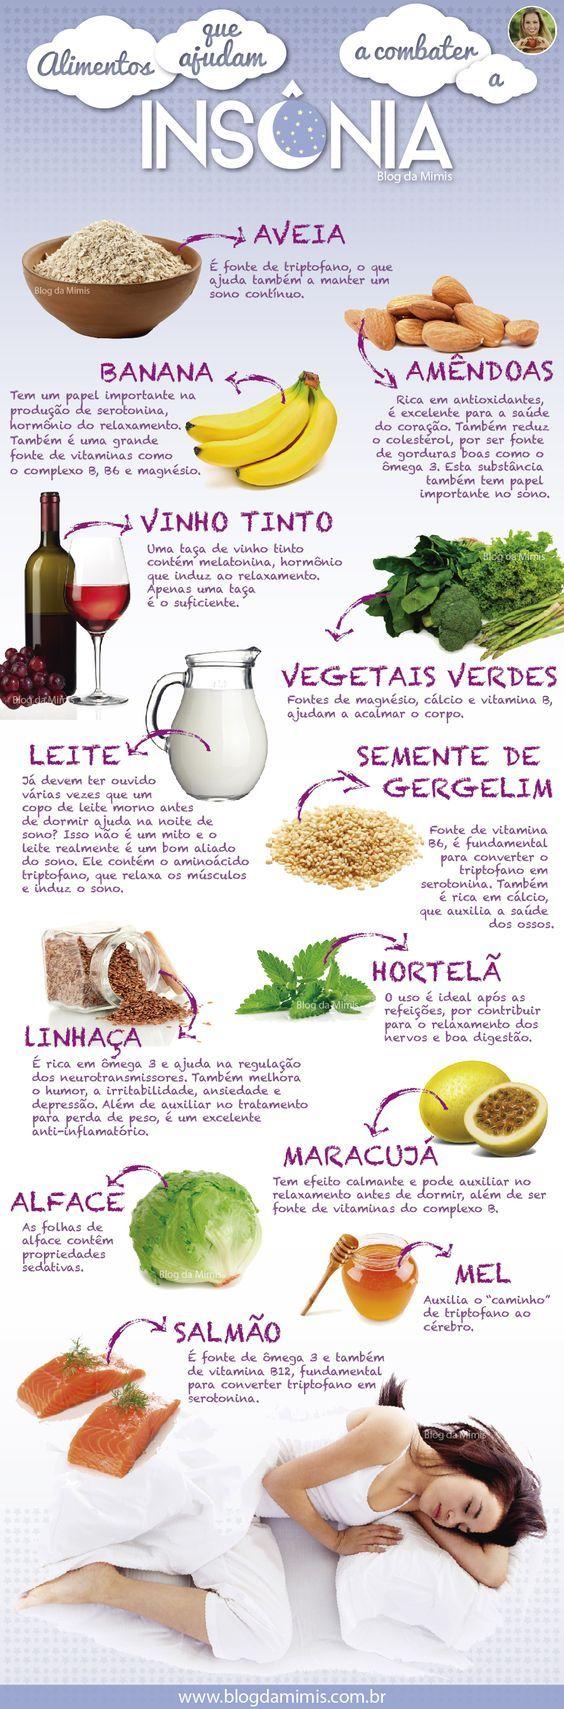 alimentos-insonia-blog-da-mimis-michelle-franzoni-01: